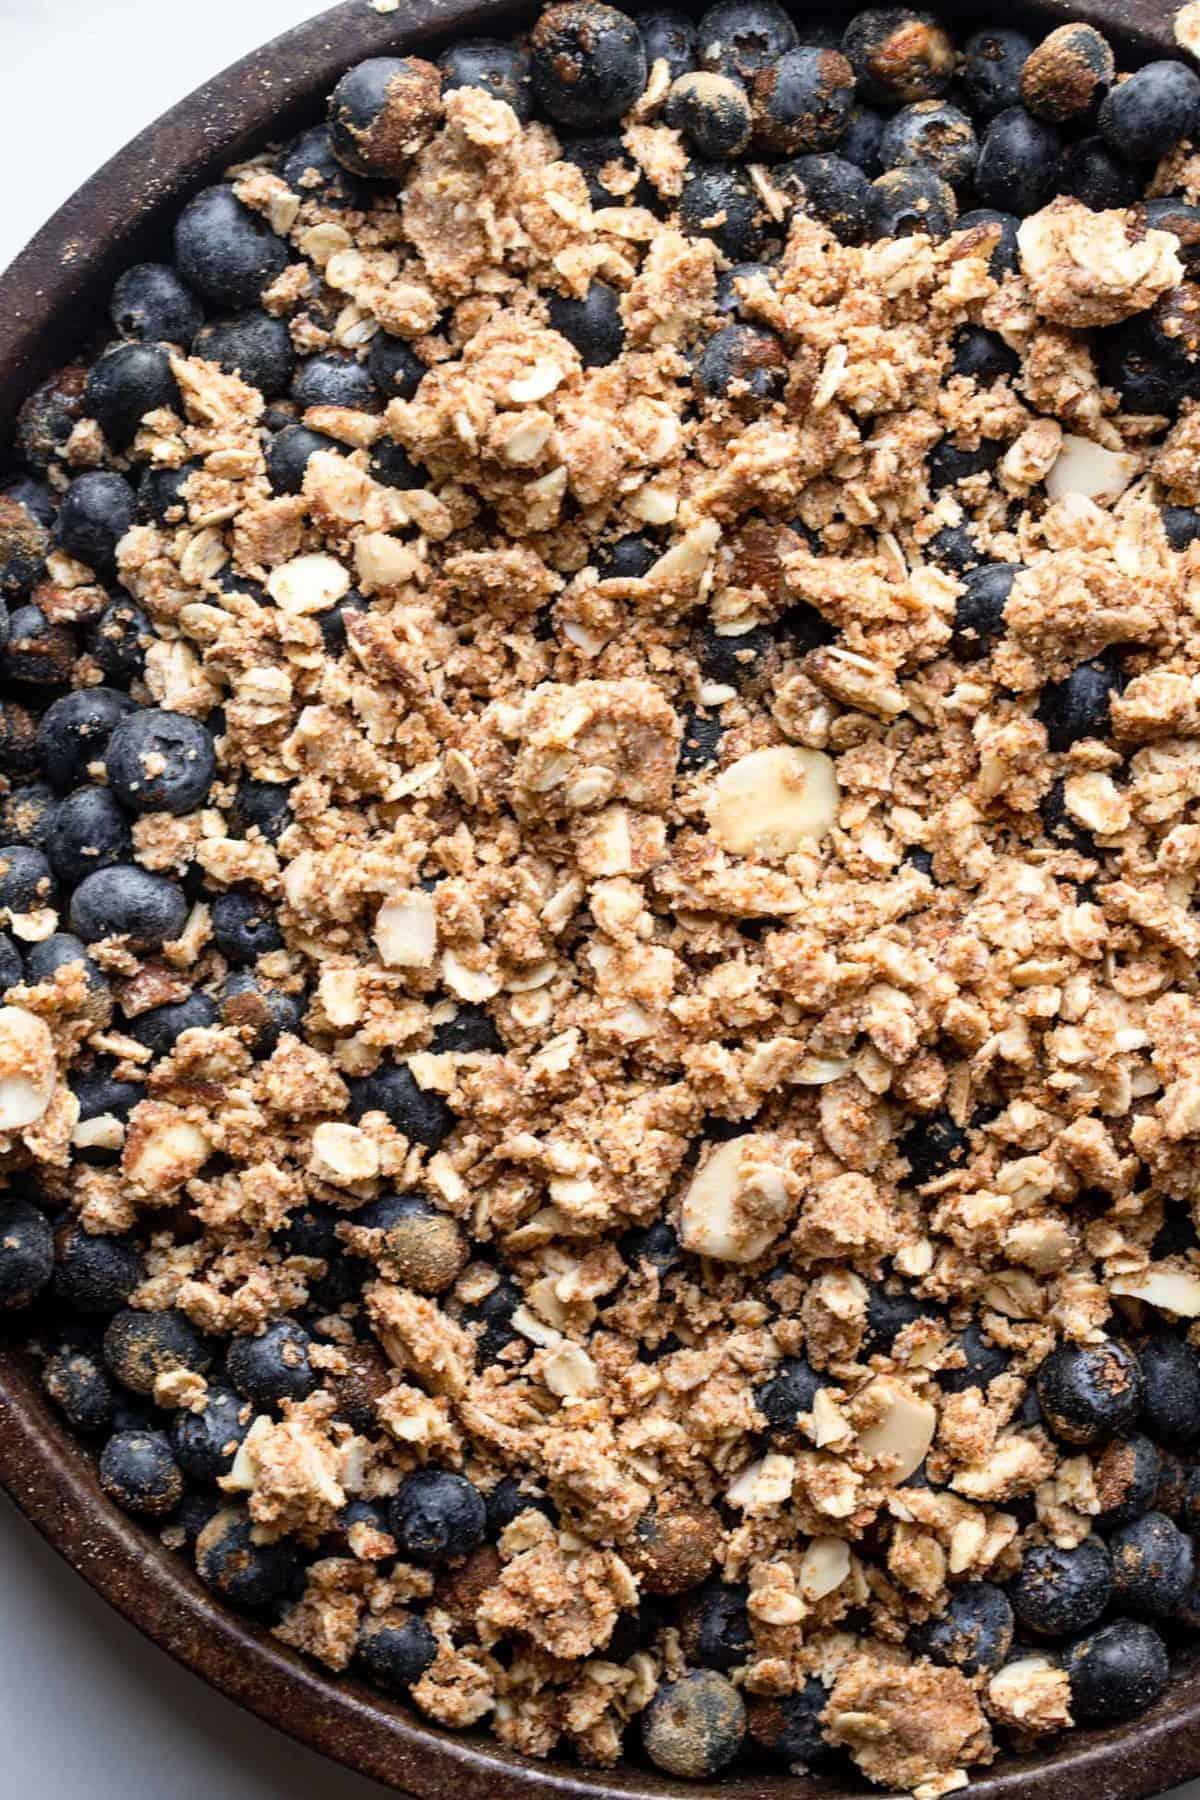 Extreme close up of Gluten Free Blueberry Crisp